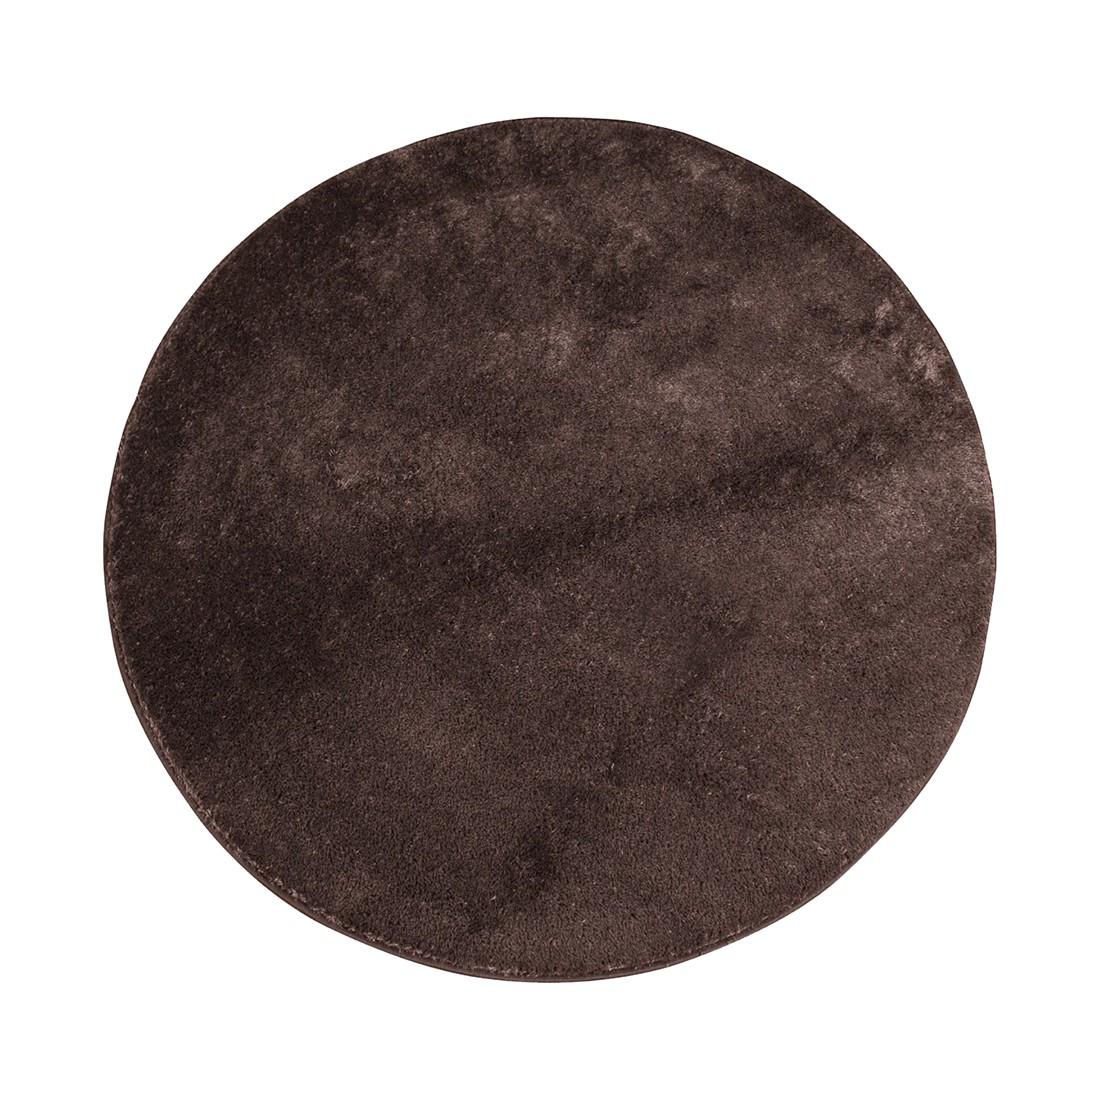 sisal teppich rund 120 cm carprola for. Black Bedroom Furniture Sets. Home Design Ideas